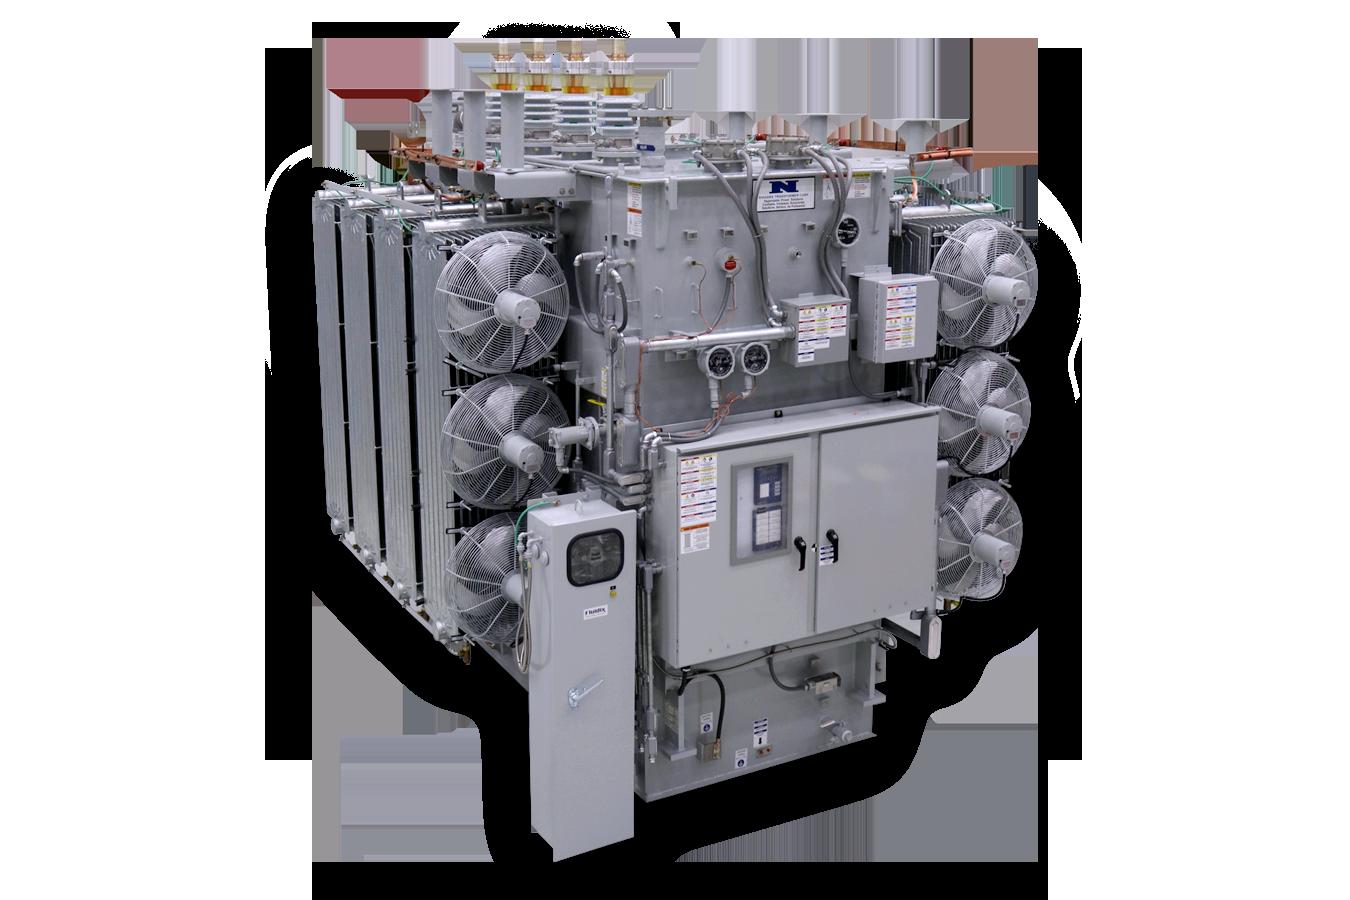 Station Service Transformer (SST) Niagara Power Transformer